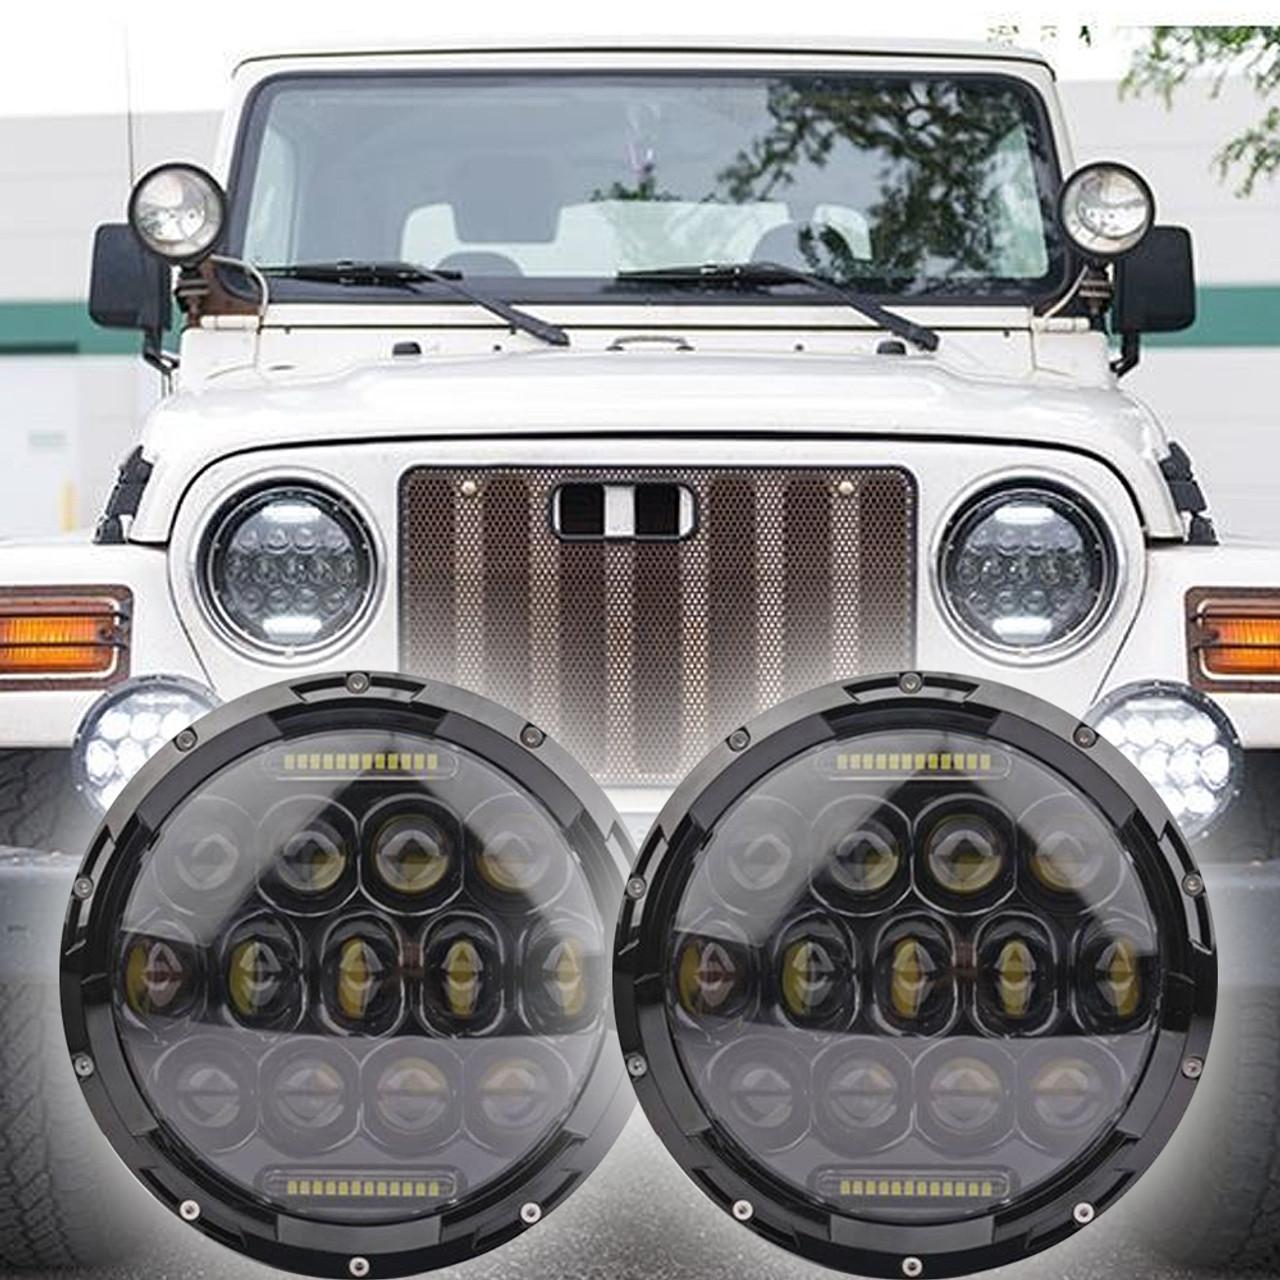 medium resolution of 1996 2006 jeep wrangler tj led headlight kit oracle 75w black projector style